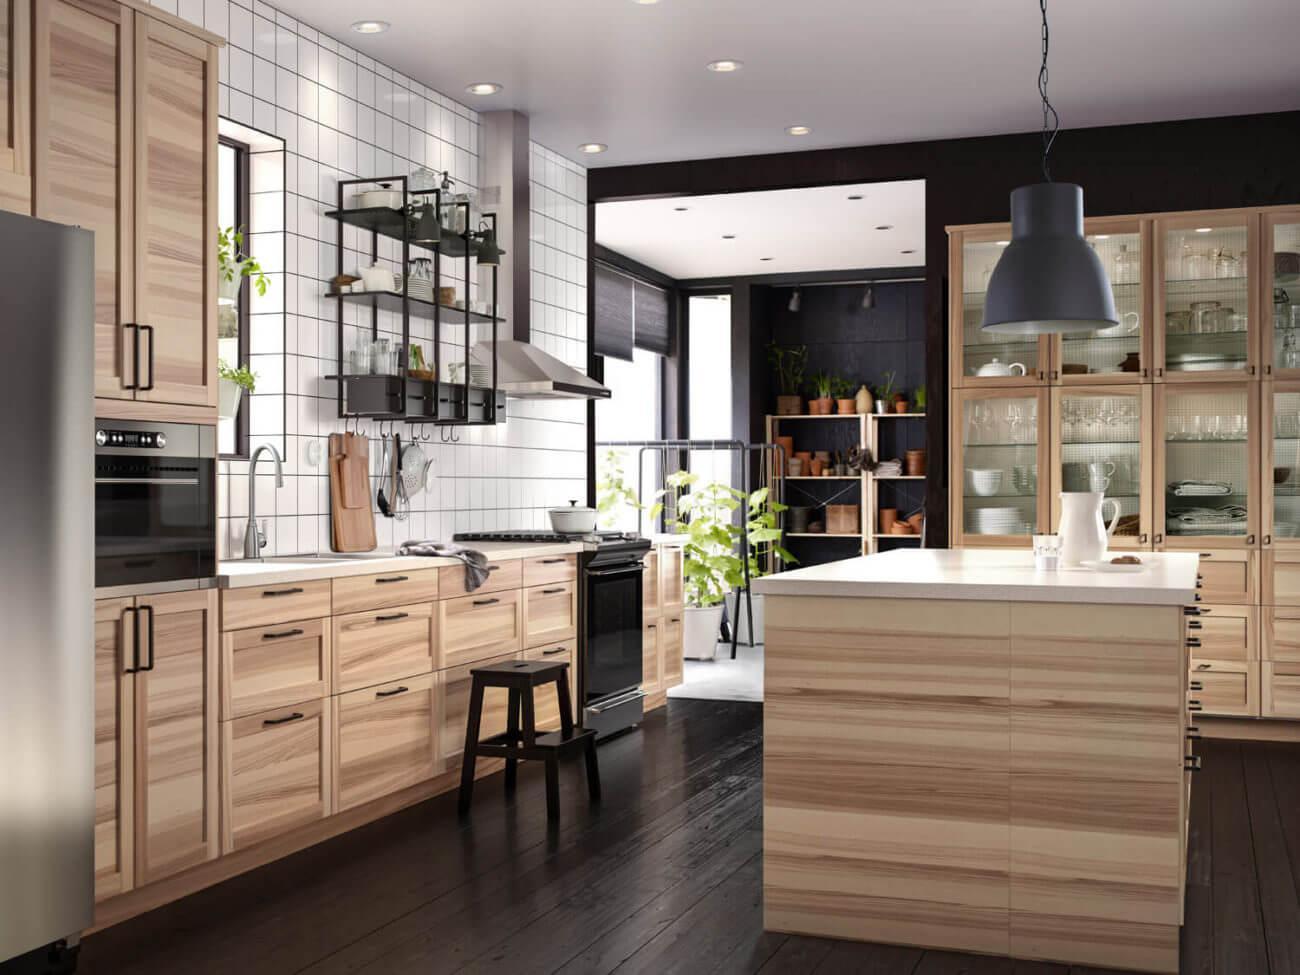 Ikea Küchenfronten Holz